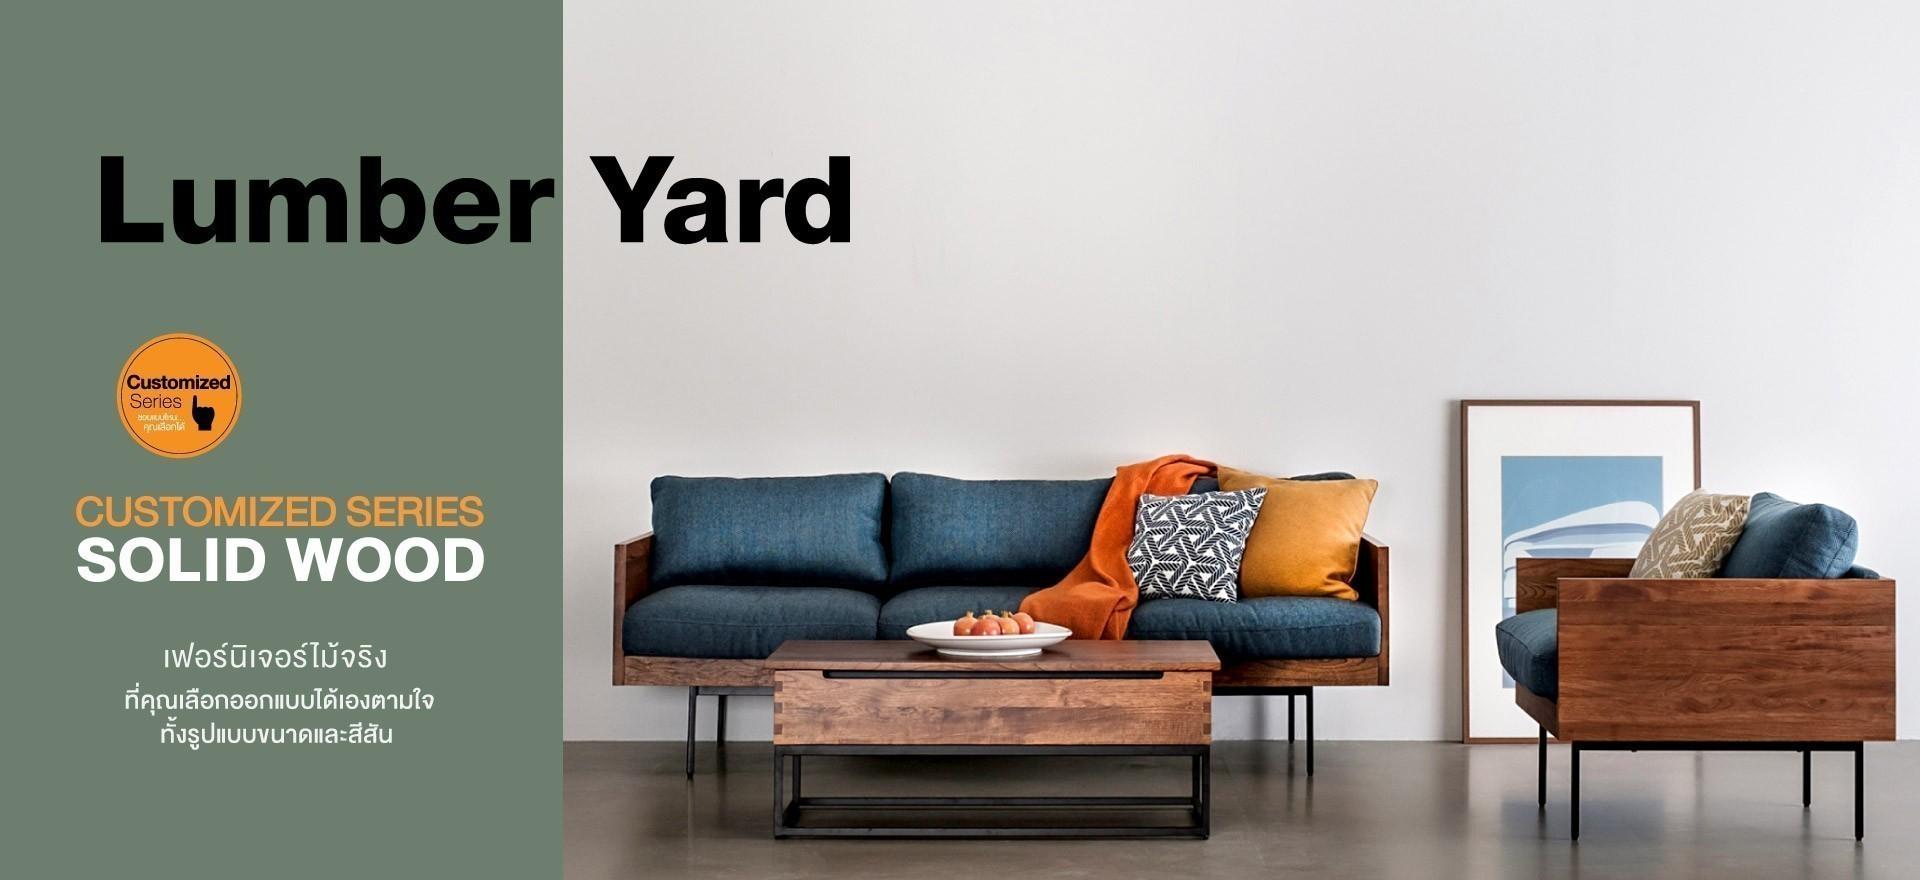 Lumber Yard Catalog